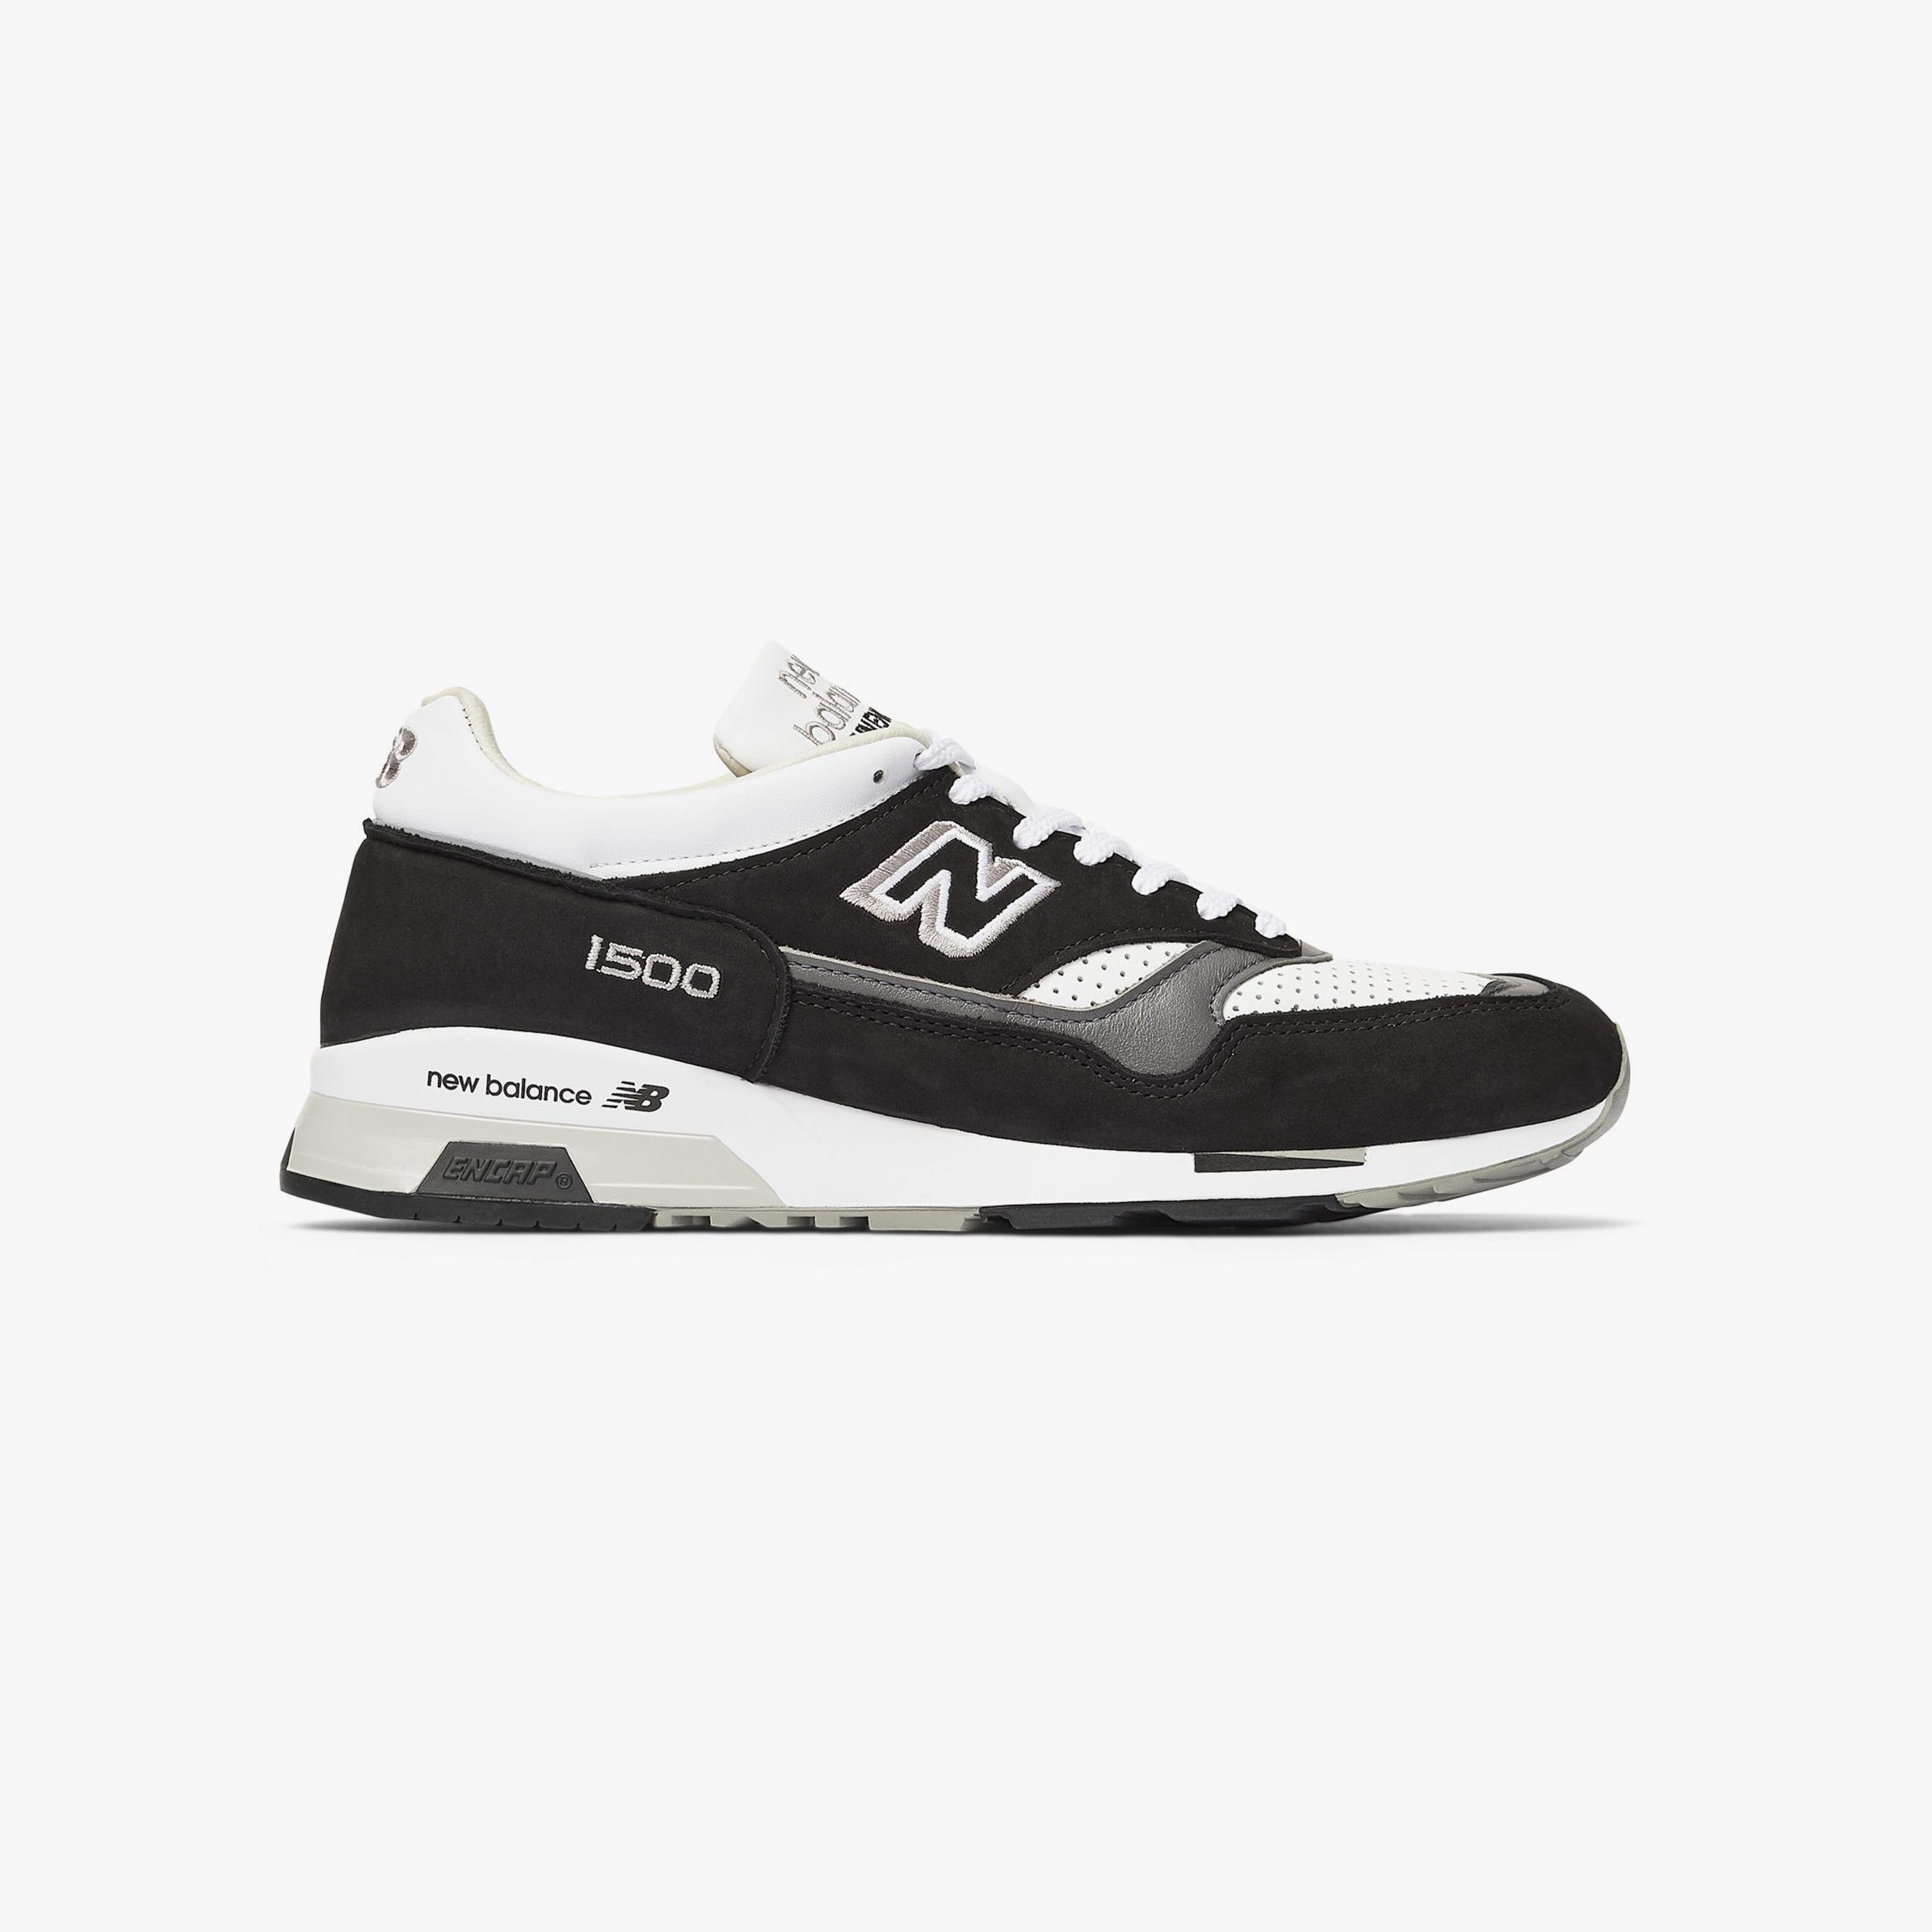 New Balance M1500 - M1500kgw - SNS | sneakers & streetwear online ...